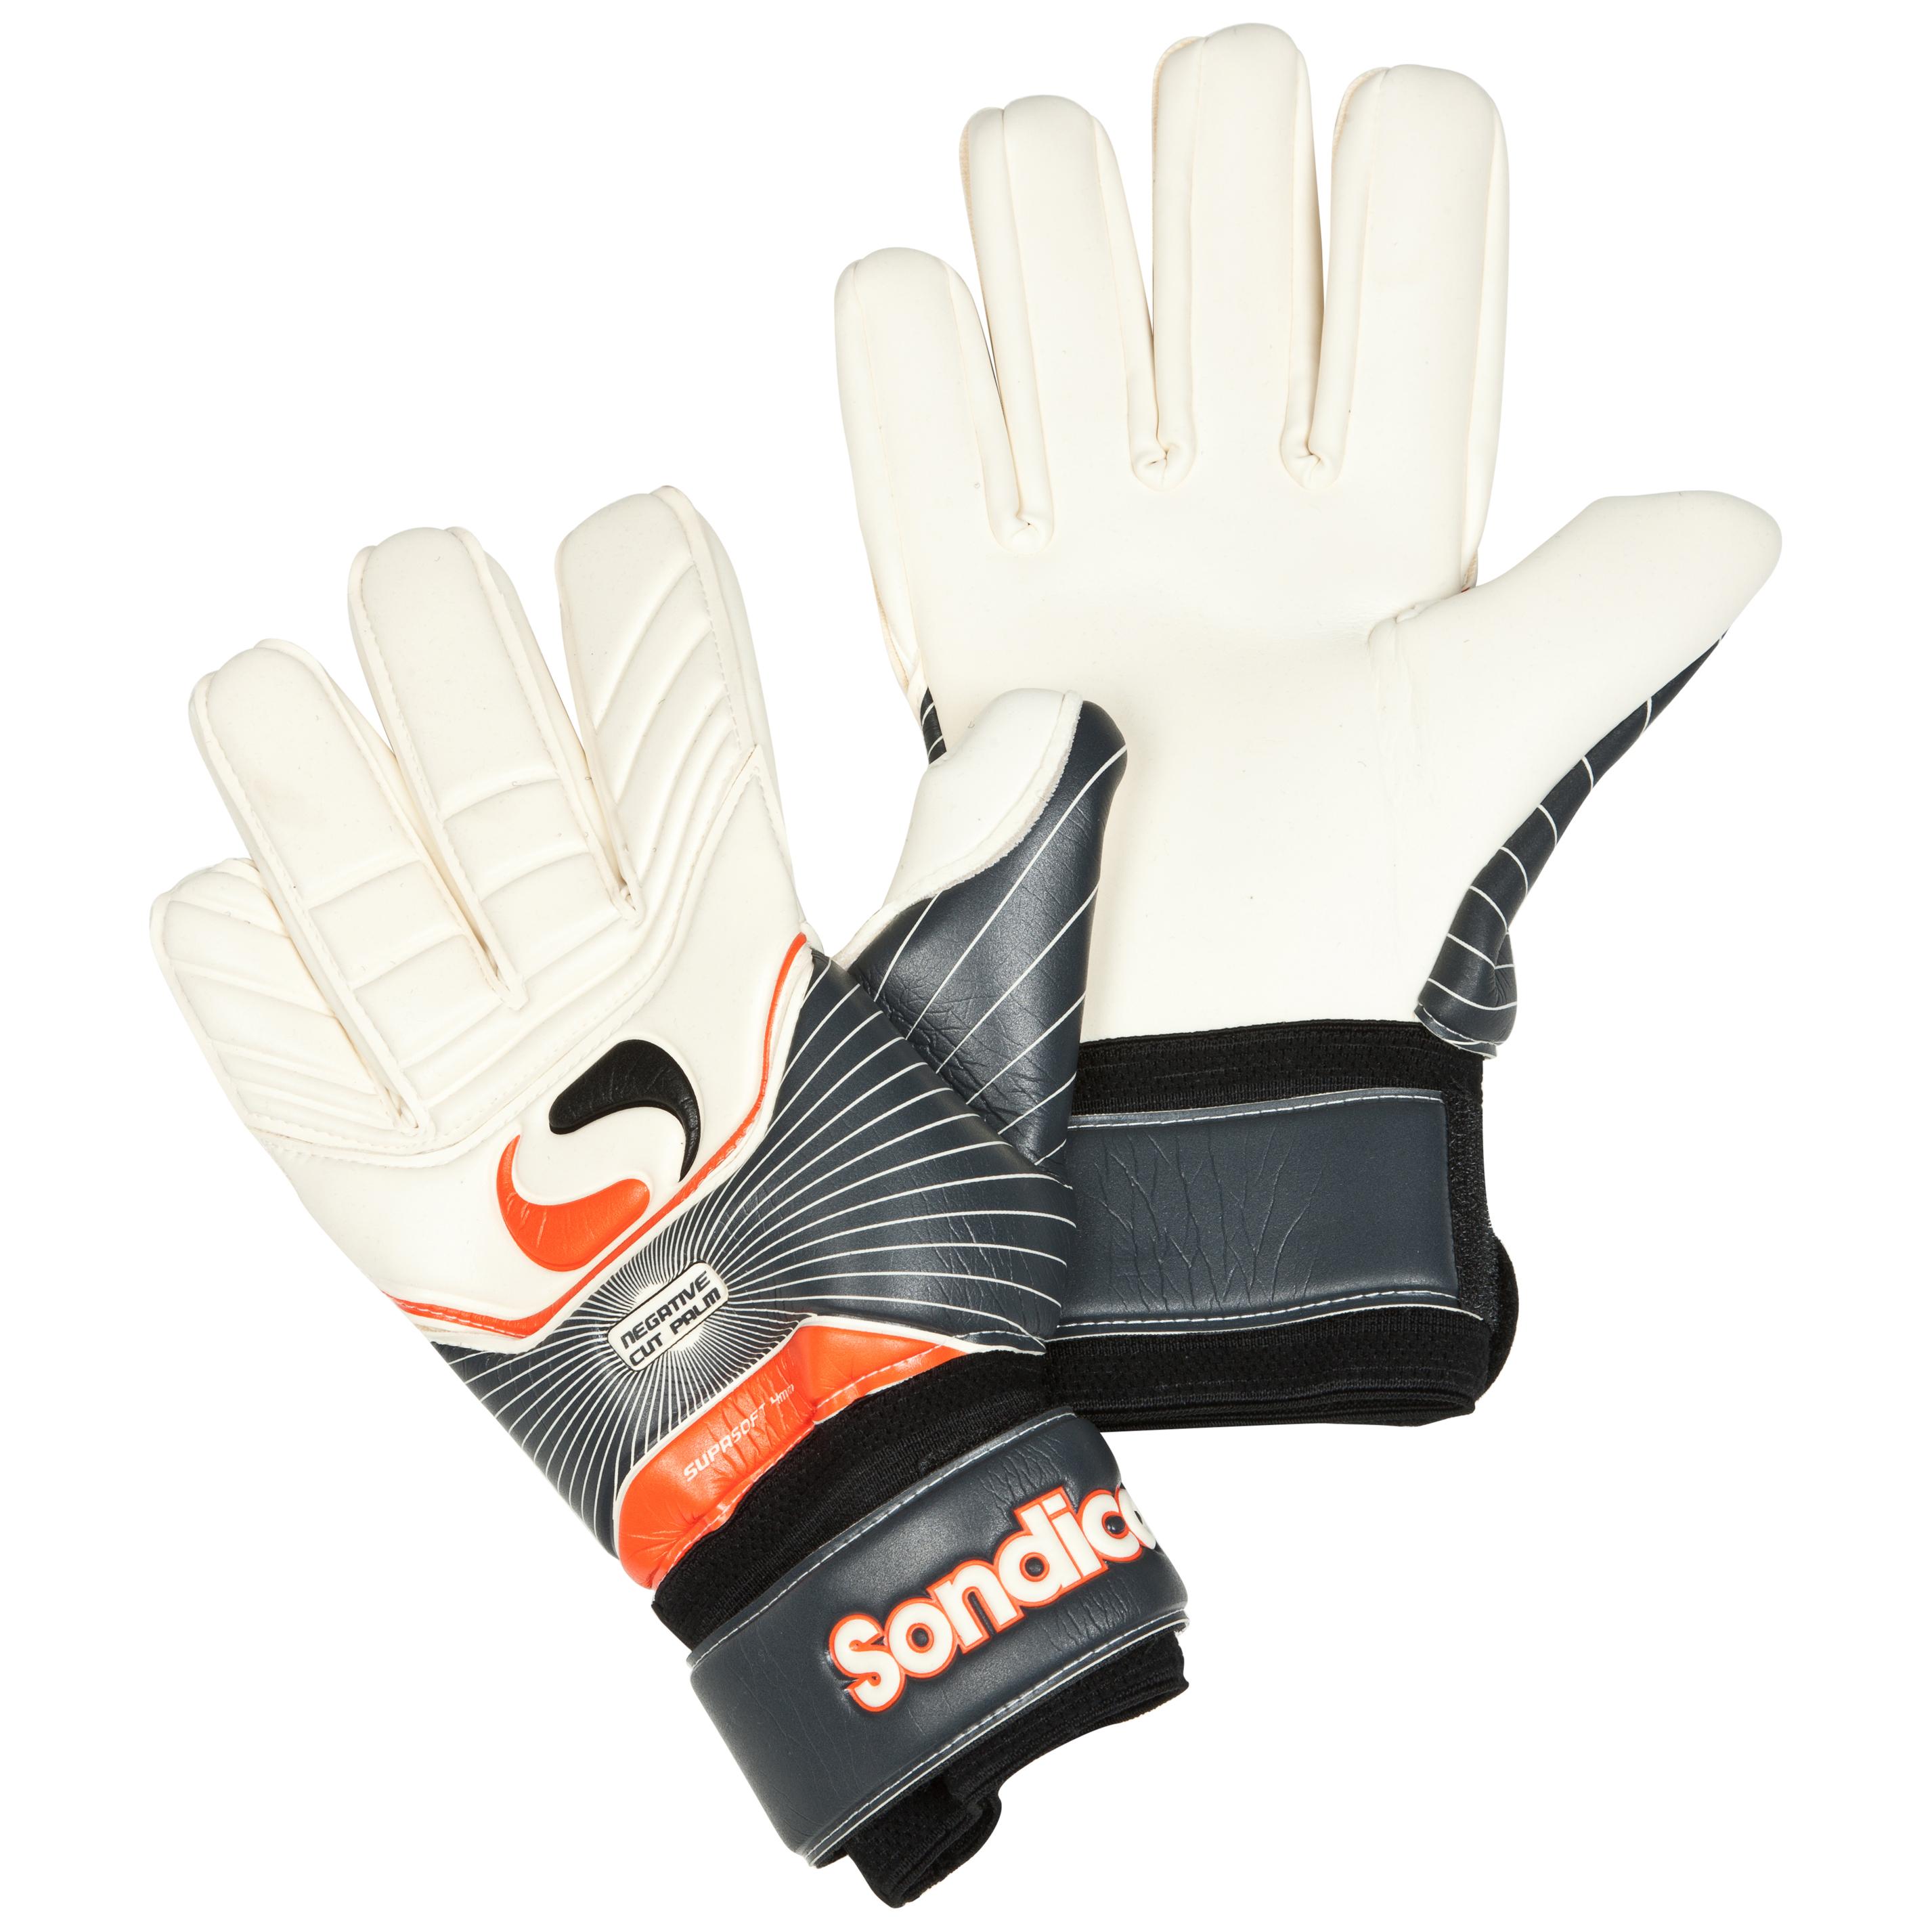 Sondico Ultima Academy Negative Cut Goalkeeper Gloves - Black/White/Gun Metal/Orange